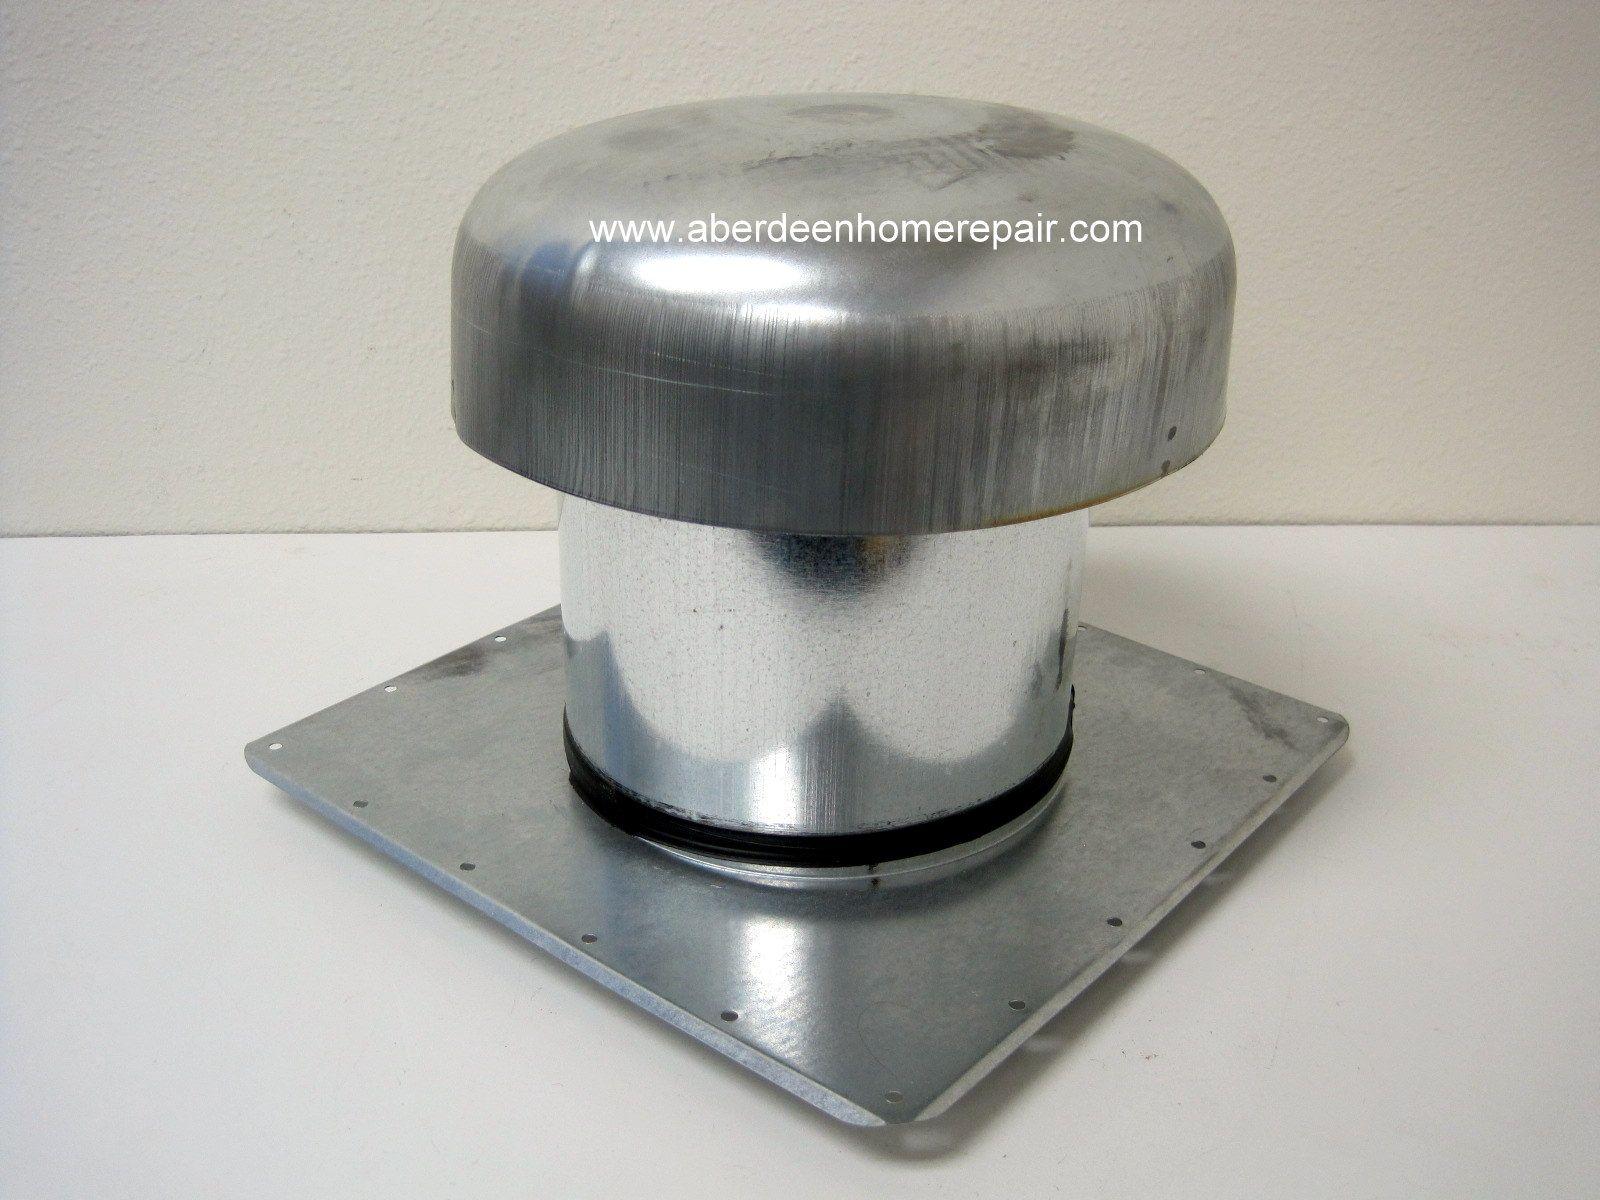 Latest Posts Under Bathroom Exhaust Fan With Light Bathroom - Round bathroom vent fan for bathroom decor ideas